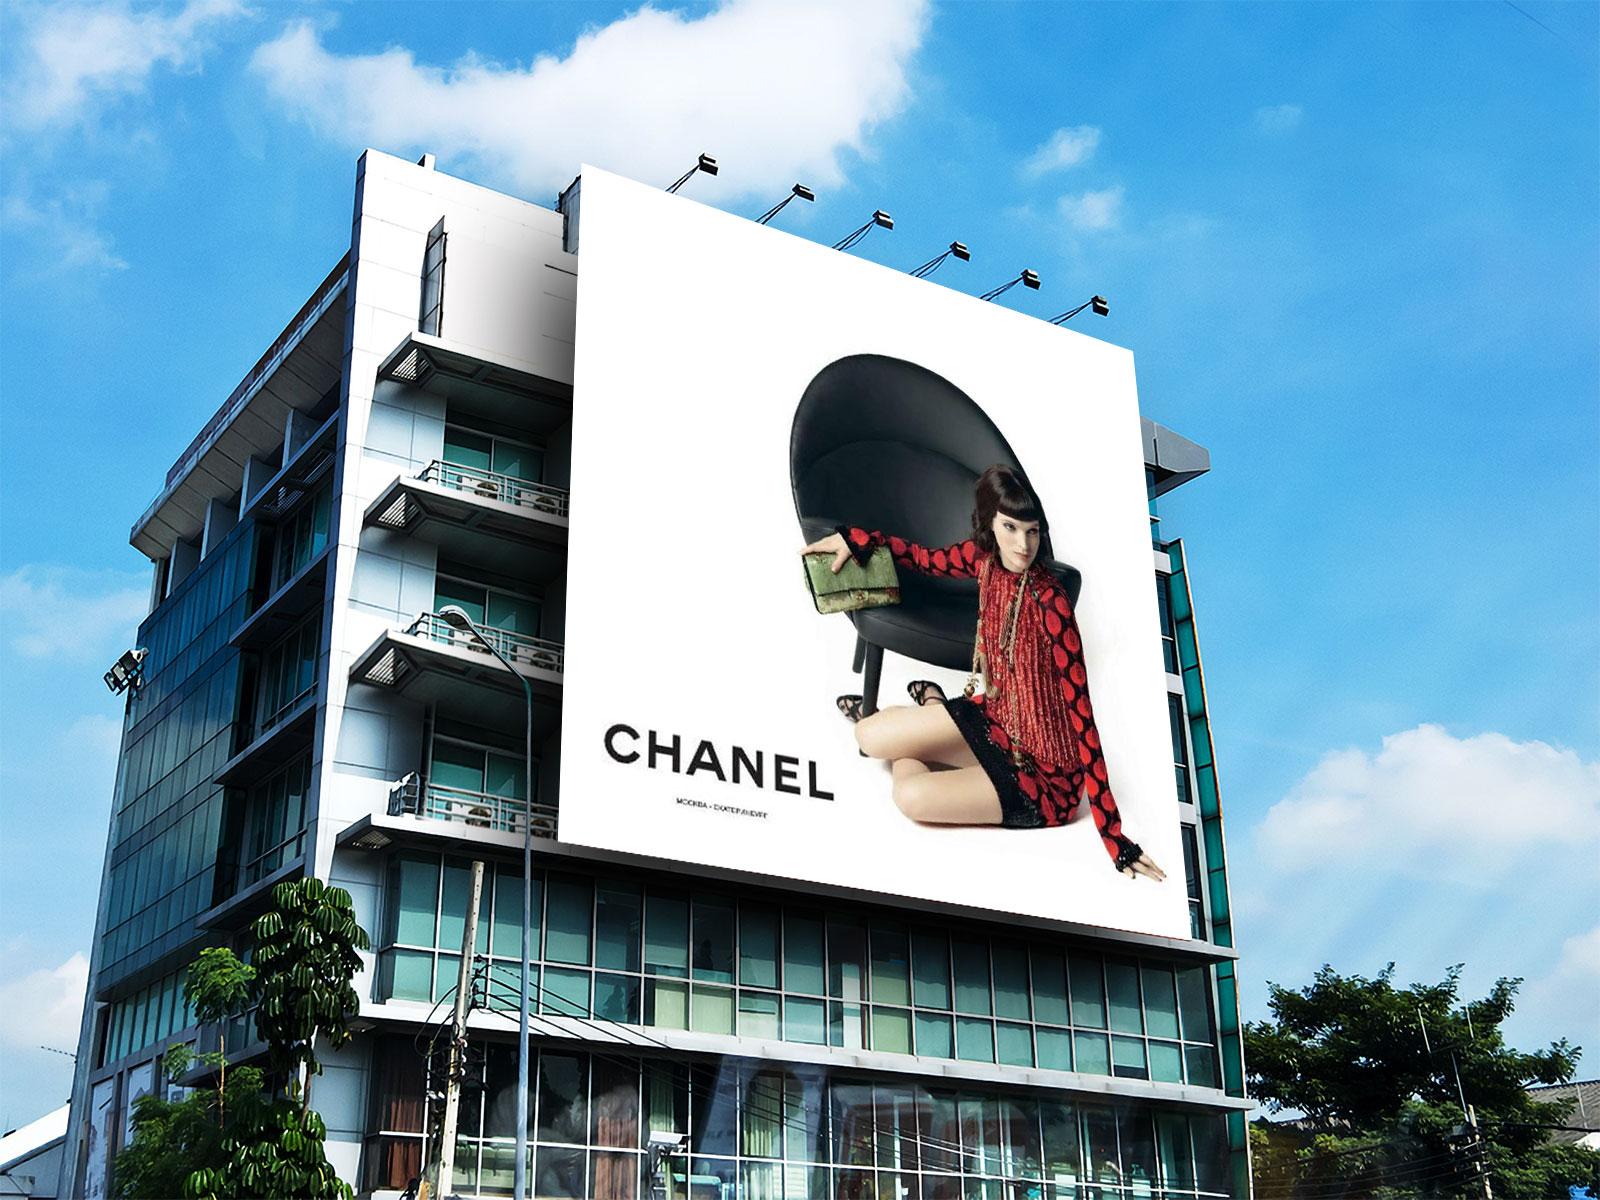 Free-Outdoor-Advertisement-Building-Billboard-Mockup-PSD-3